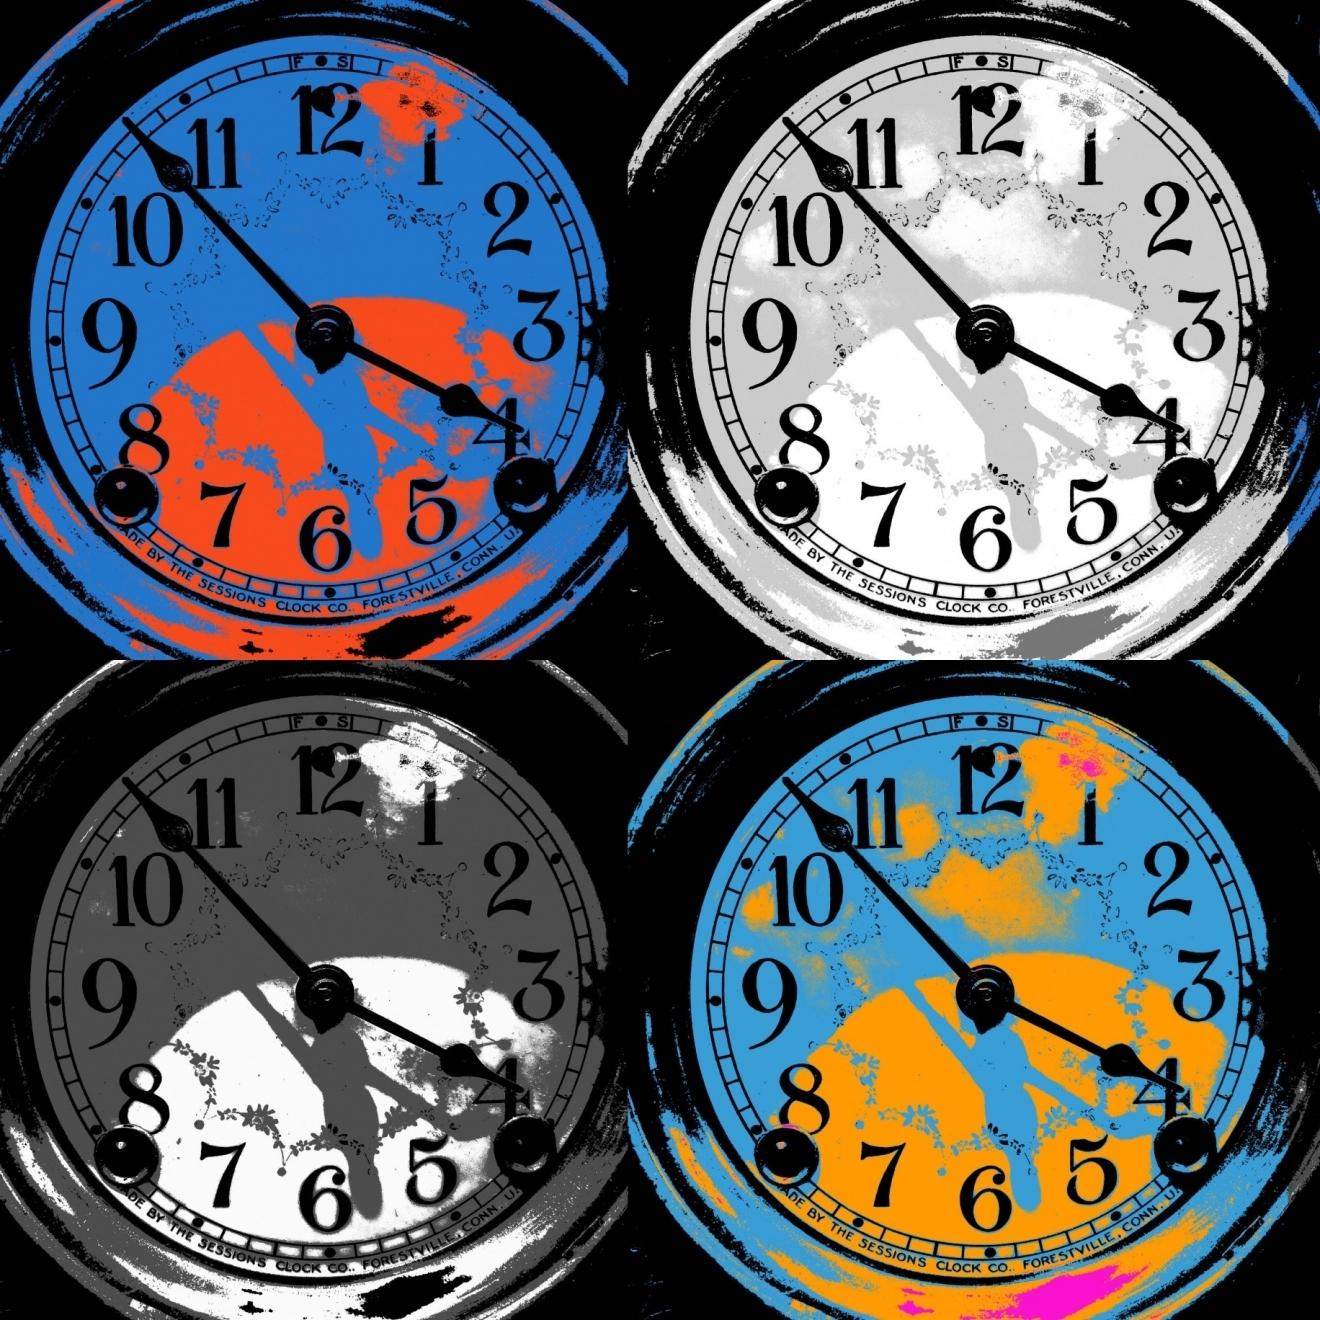 An art depiction of four clocks illustrating a shorter working week